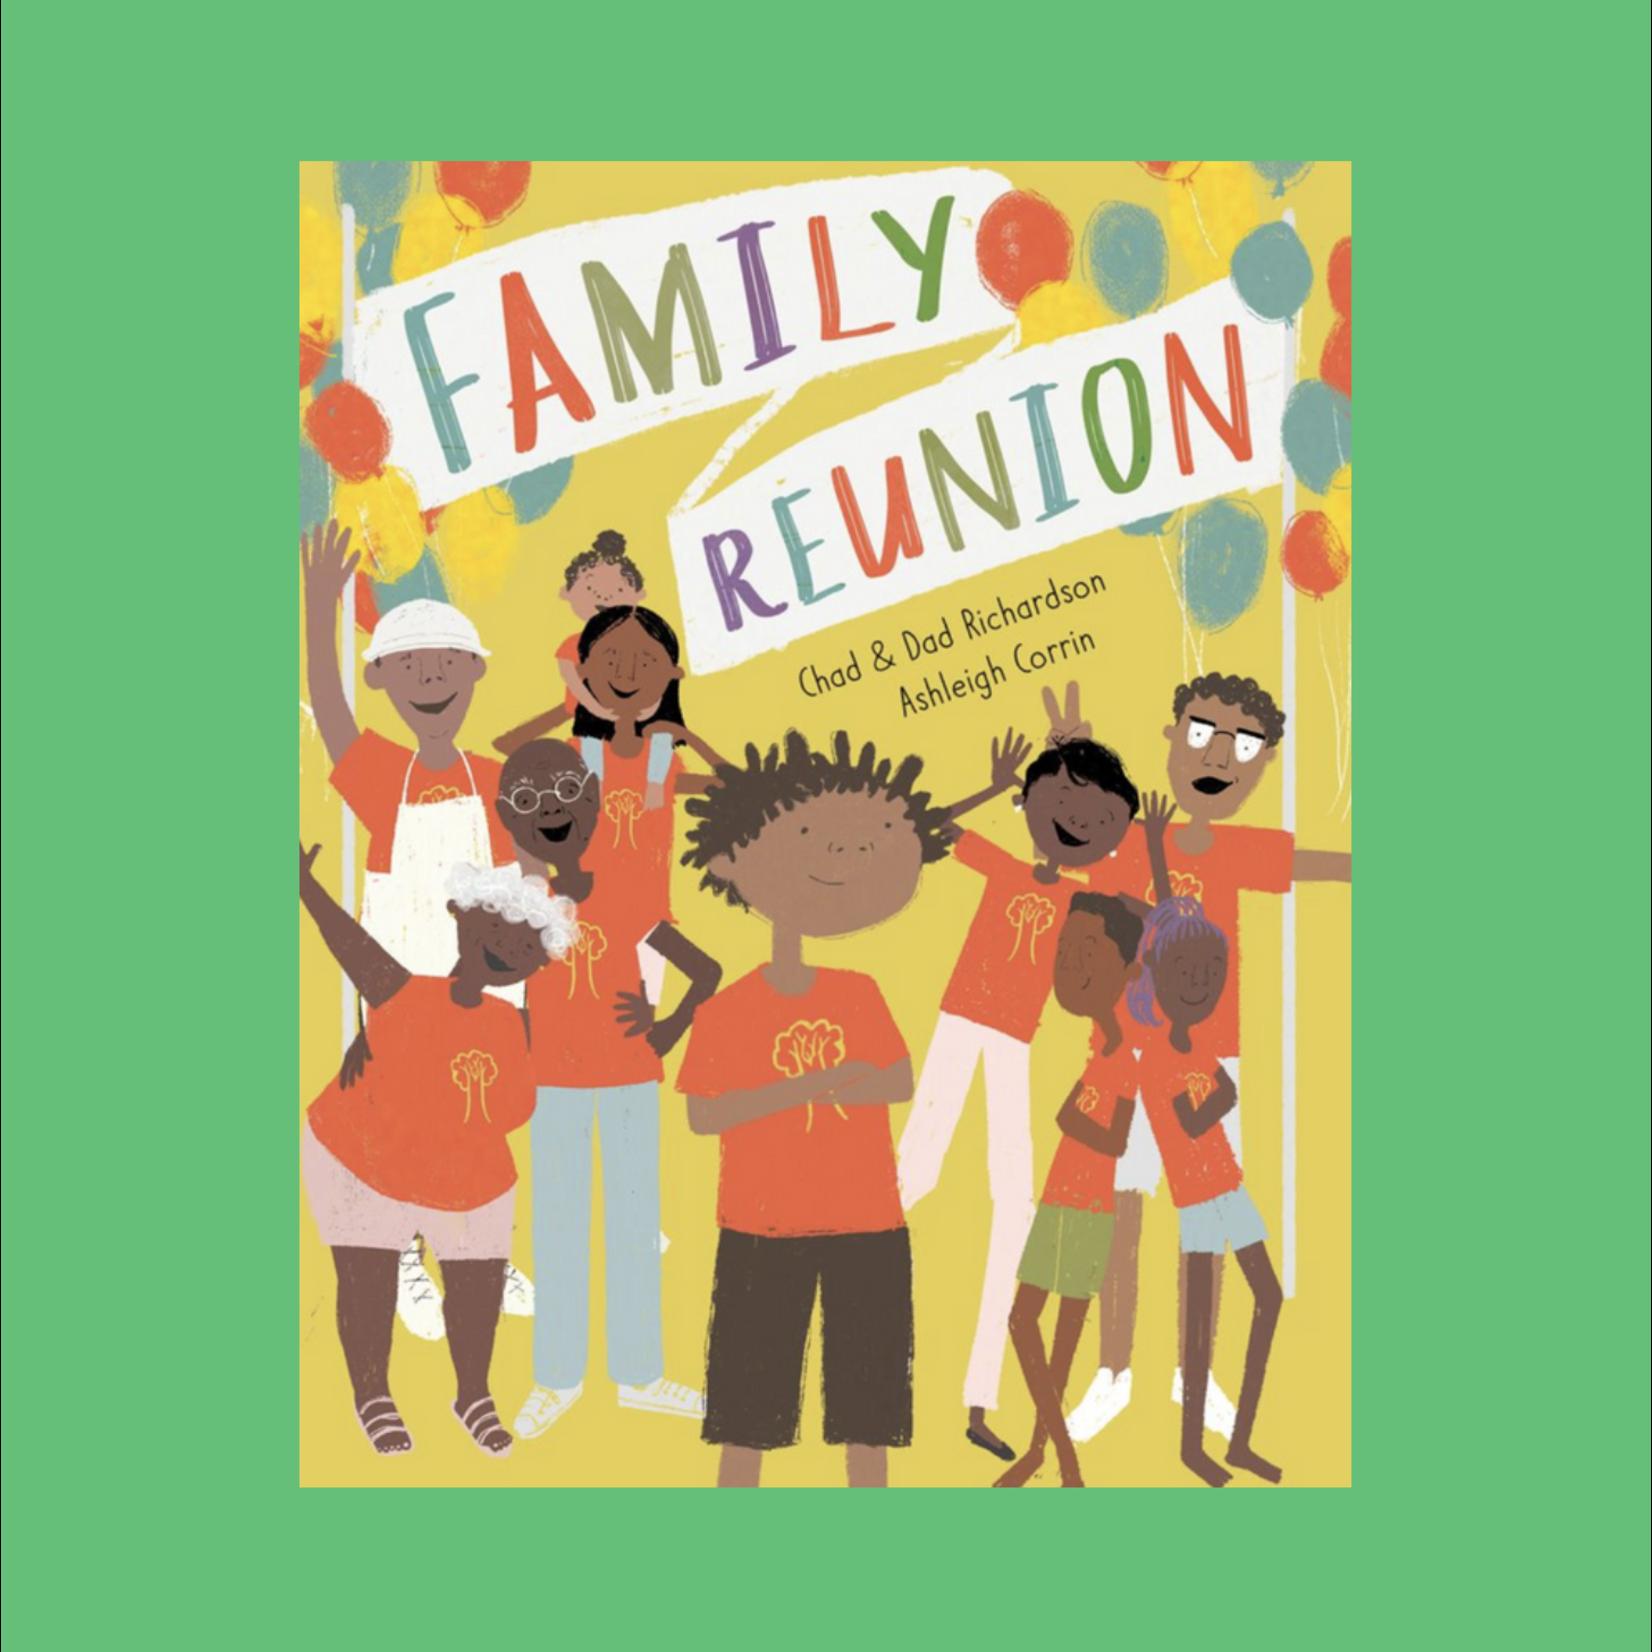 Family Reunion Book - Chad & Dad Richardson